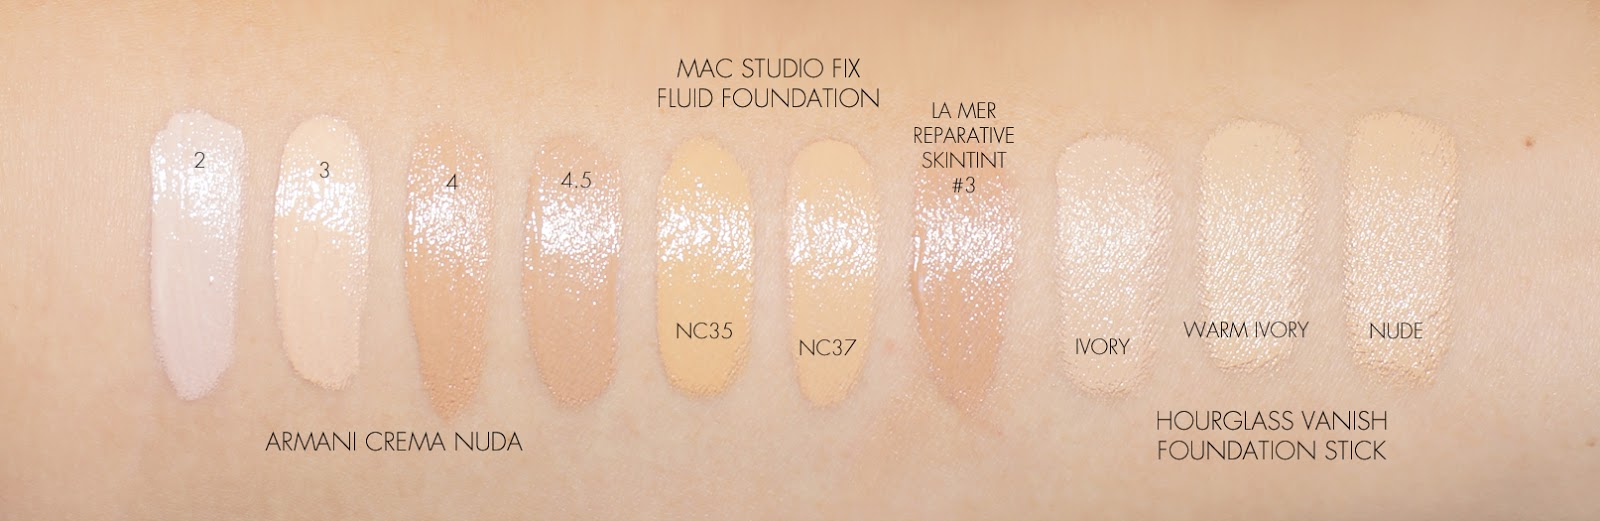 Mac Studio Fix Fluid Foundation Shades